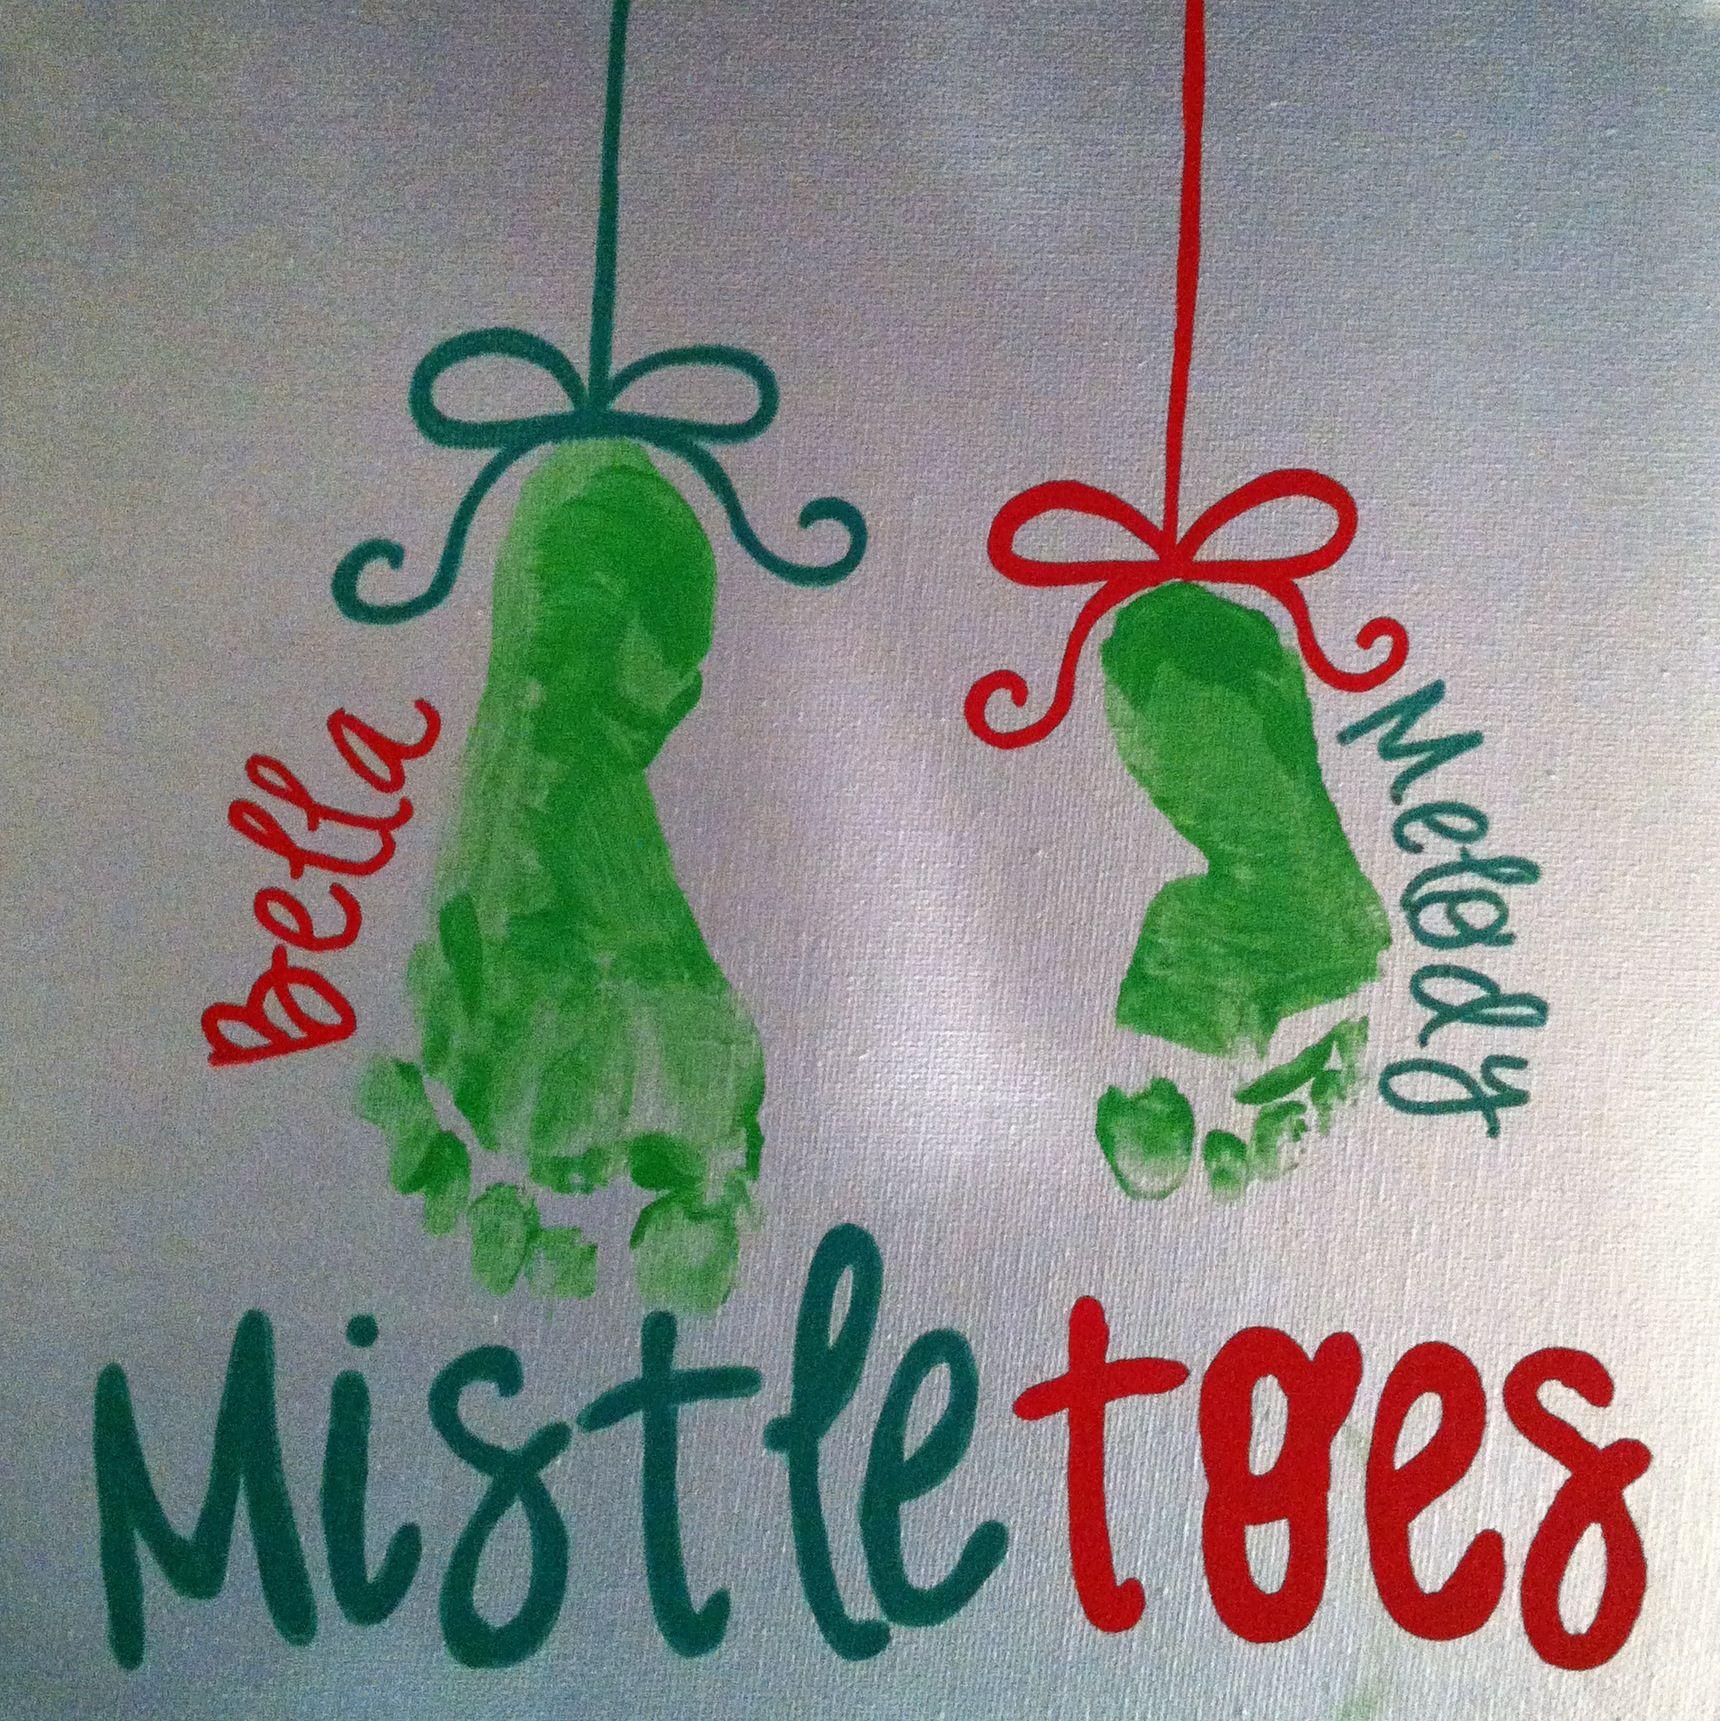 Christmas mistletoe foot prints #mistletoesfootprintcraft